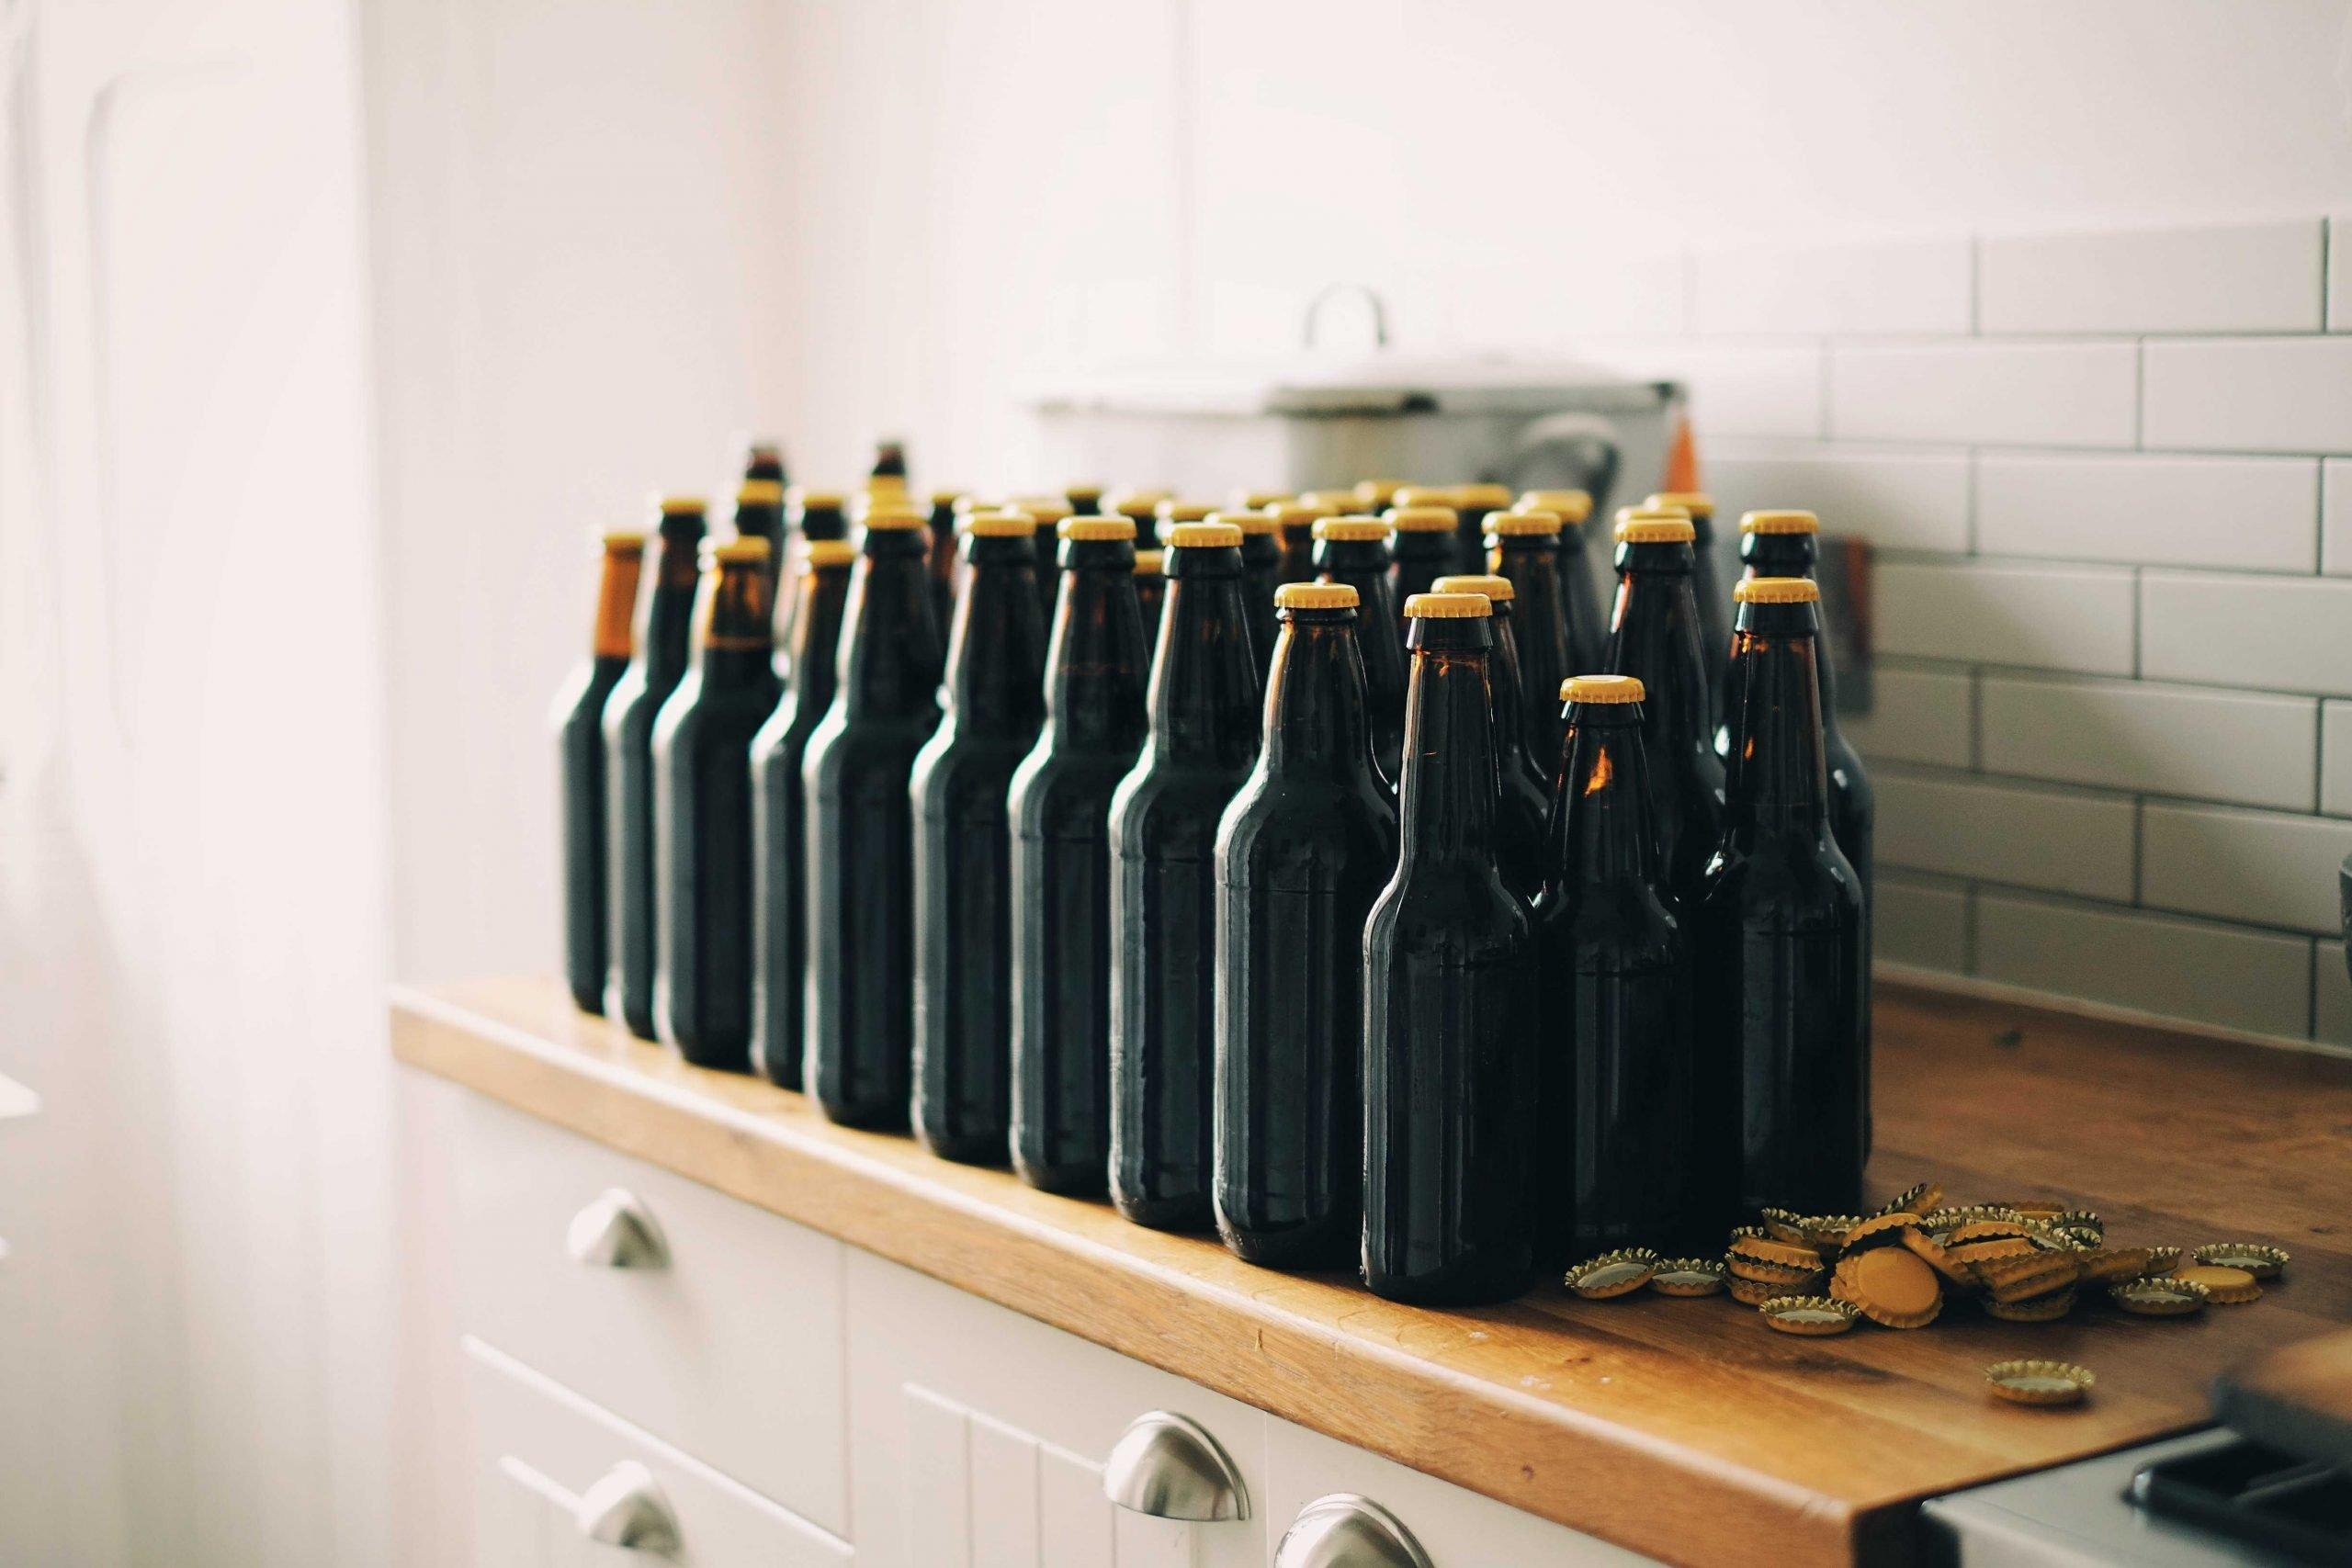 Empty beer bottles whilst considering Brewdog's digital marketing strategy